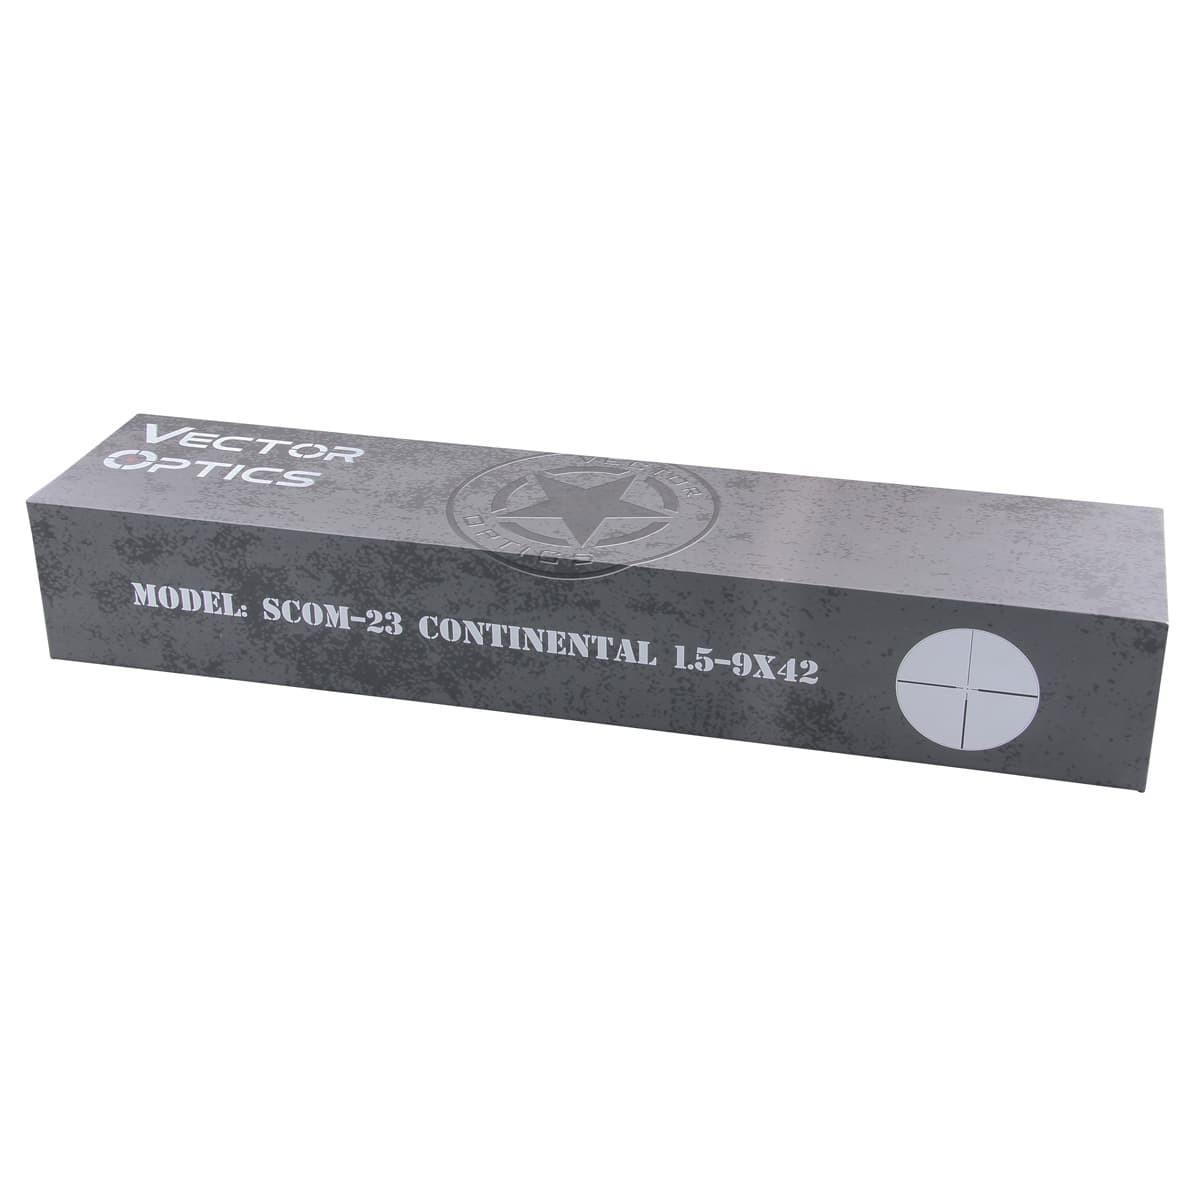 Continental 1.5-9×42 SCOM-23